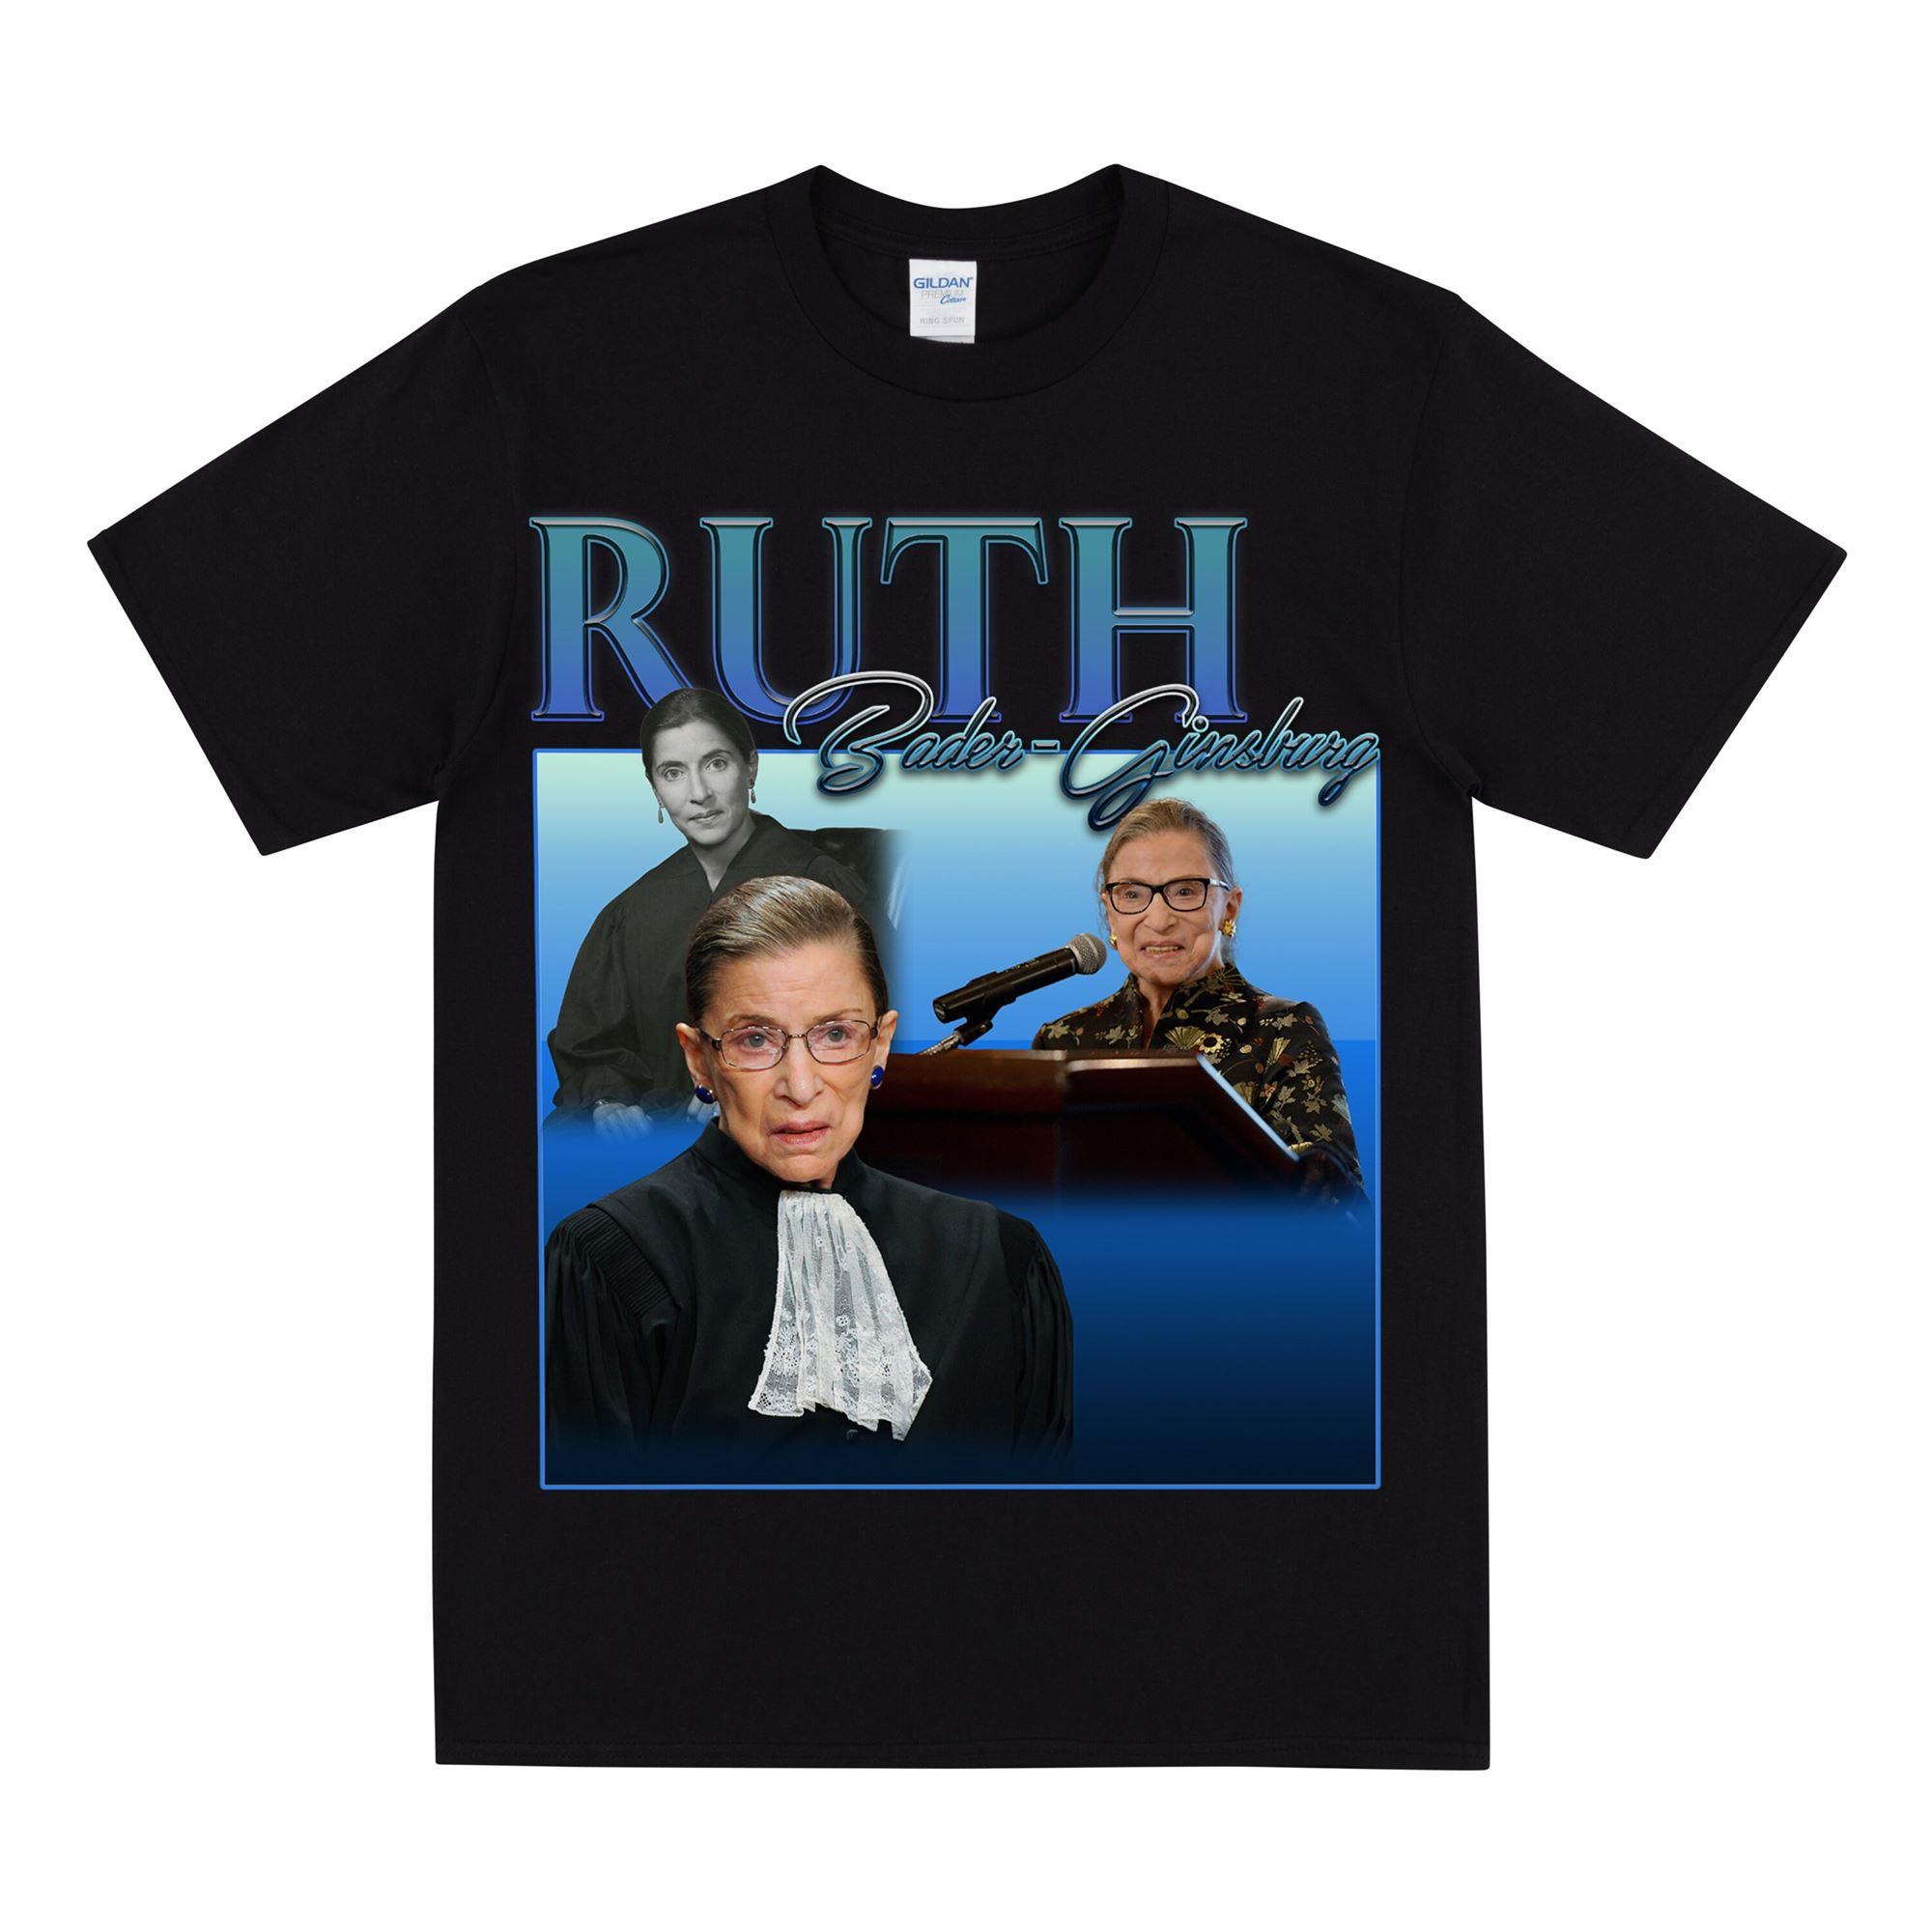 Ruth Bader - Ginsburg Tribute T-shirt Women Men Unisex T Shirt Feminism Tee For Females